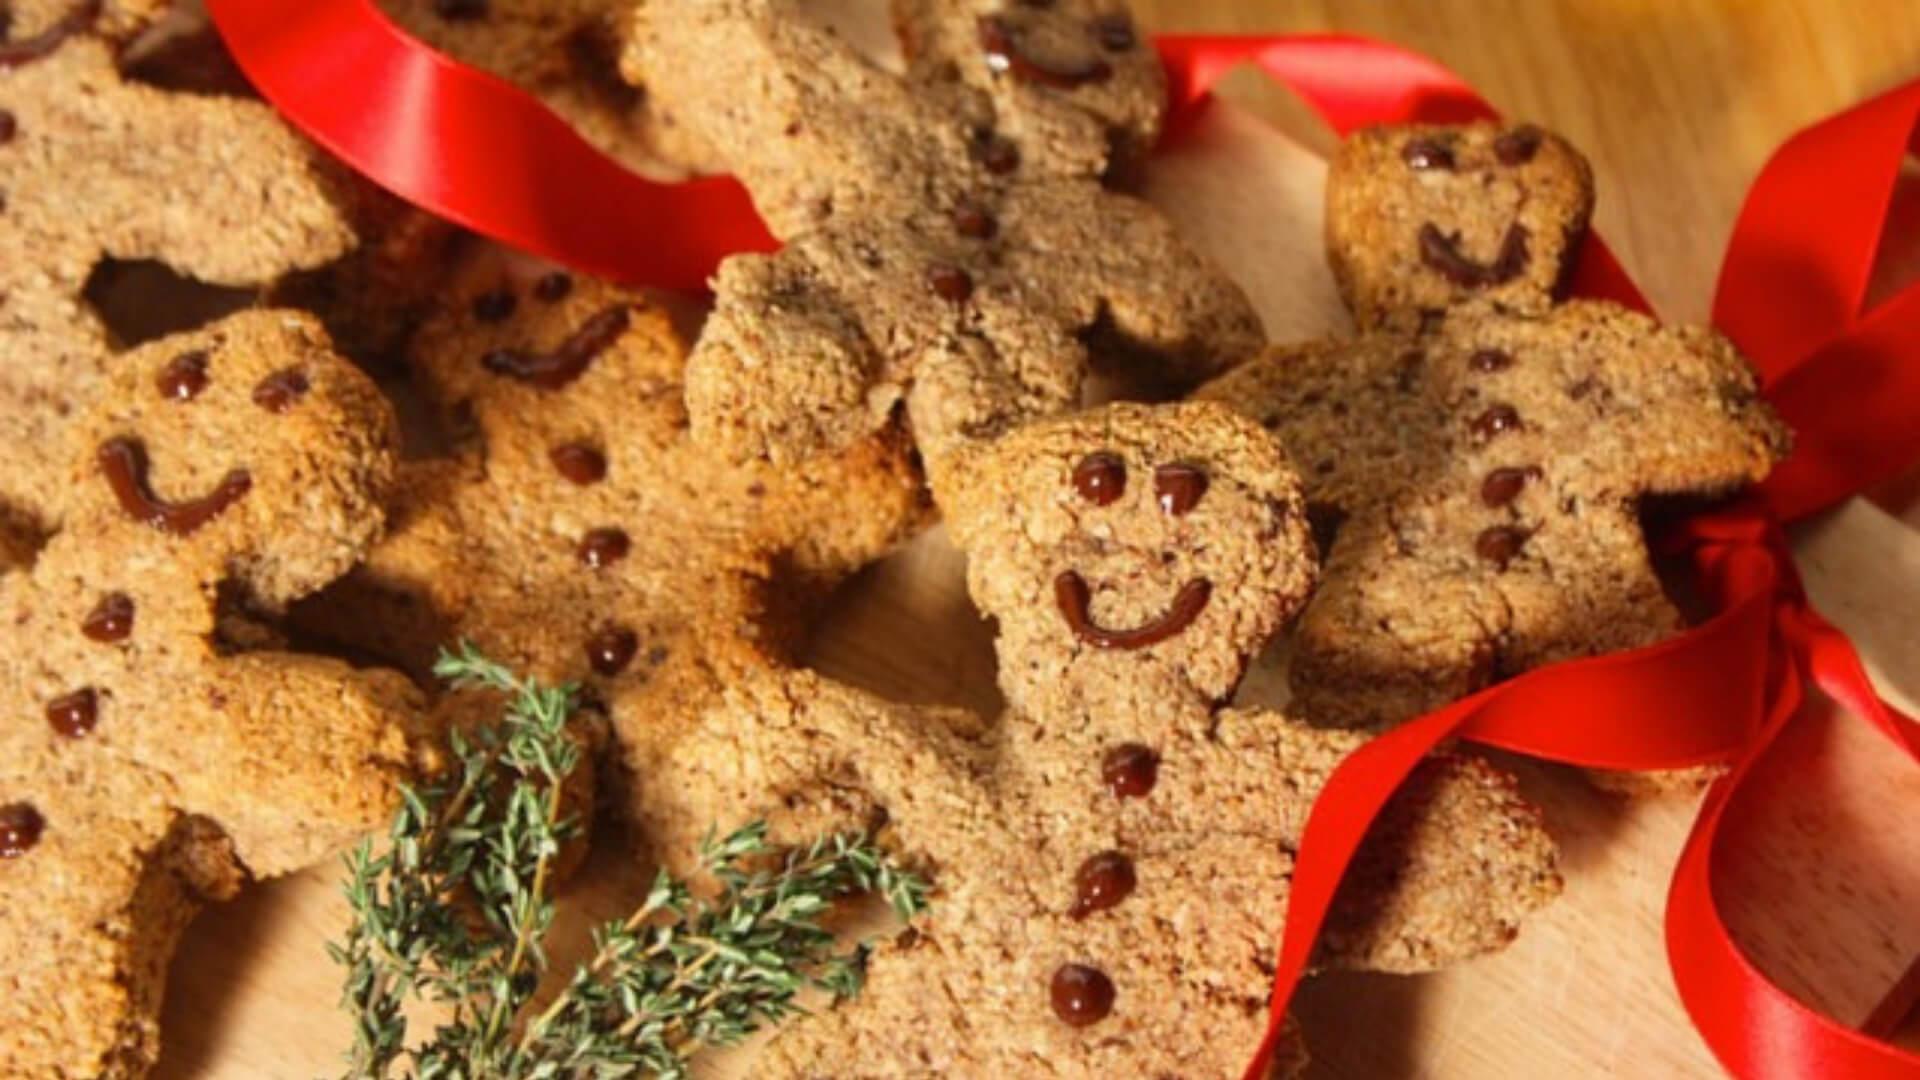 Three Wise Gingerbread Men